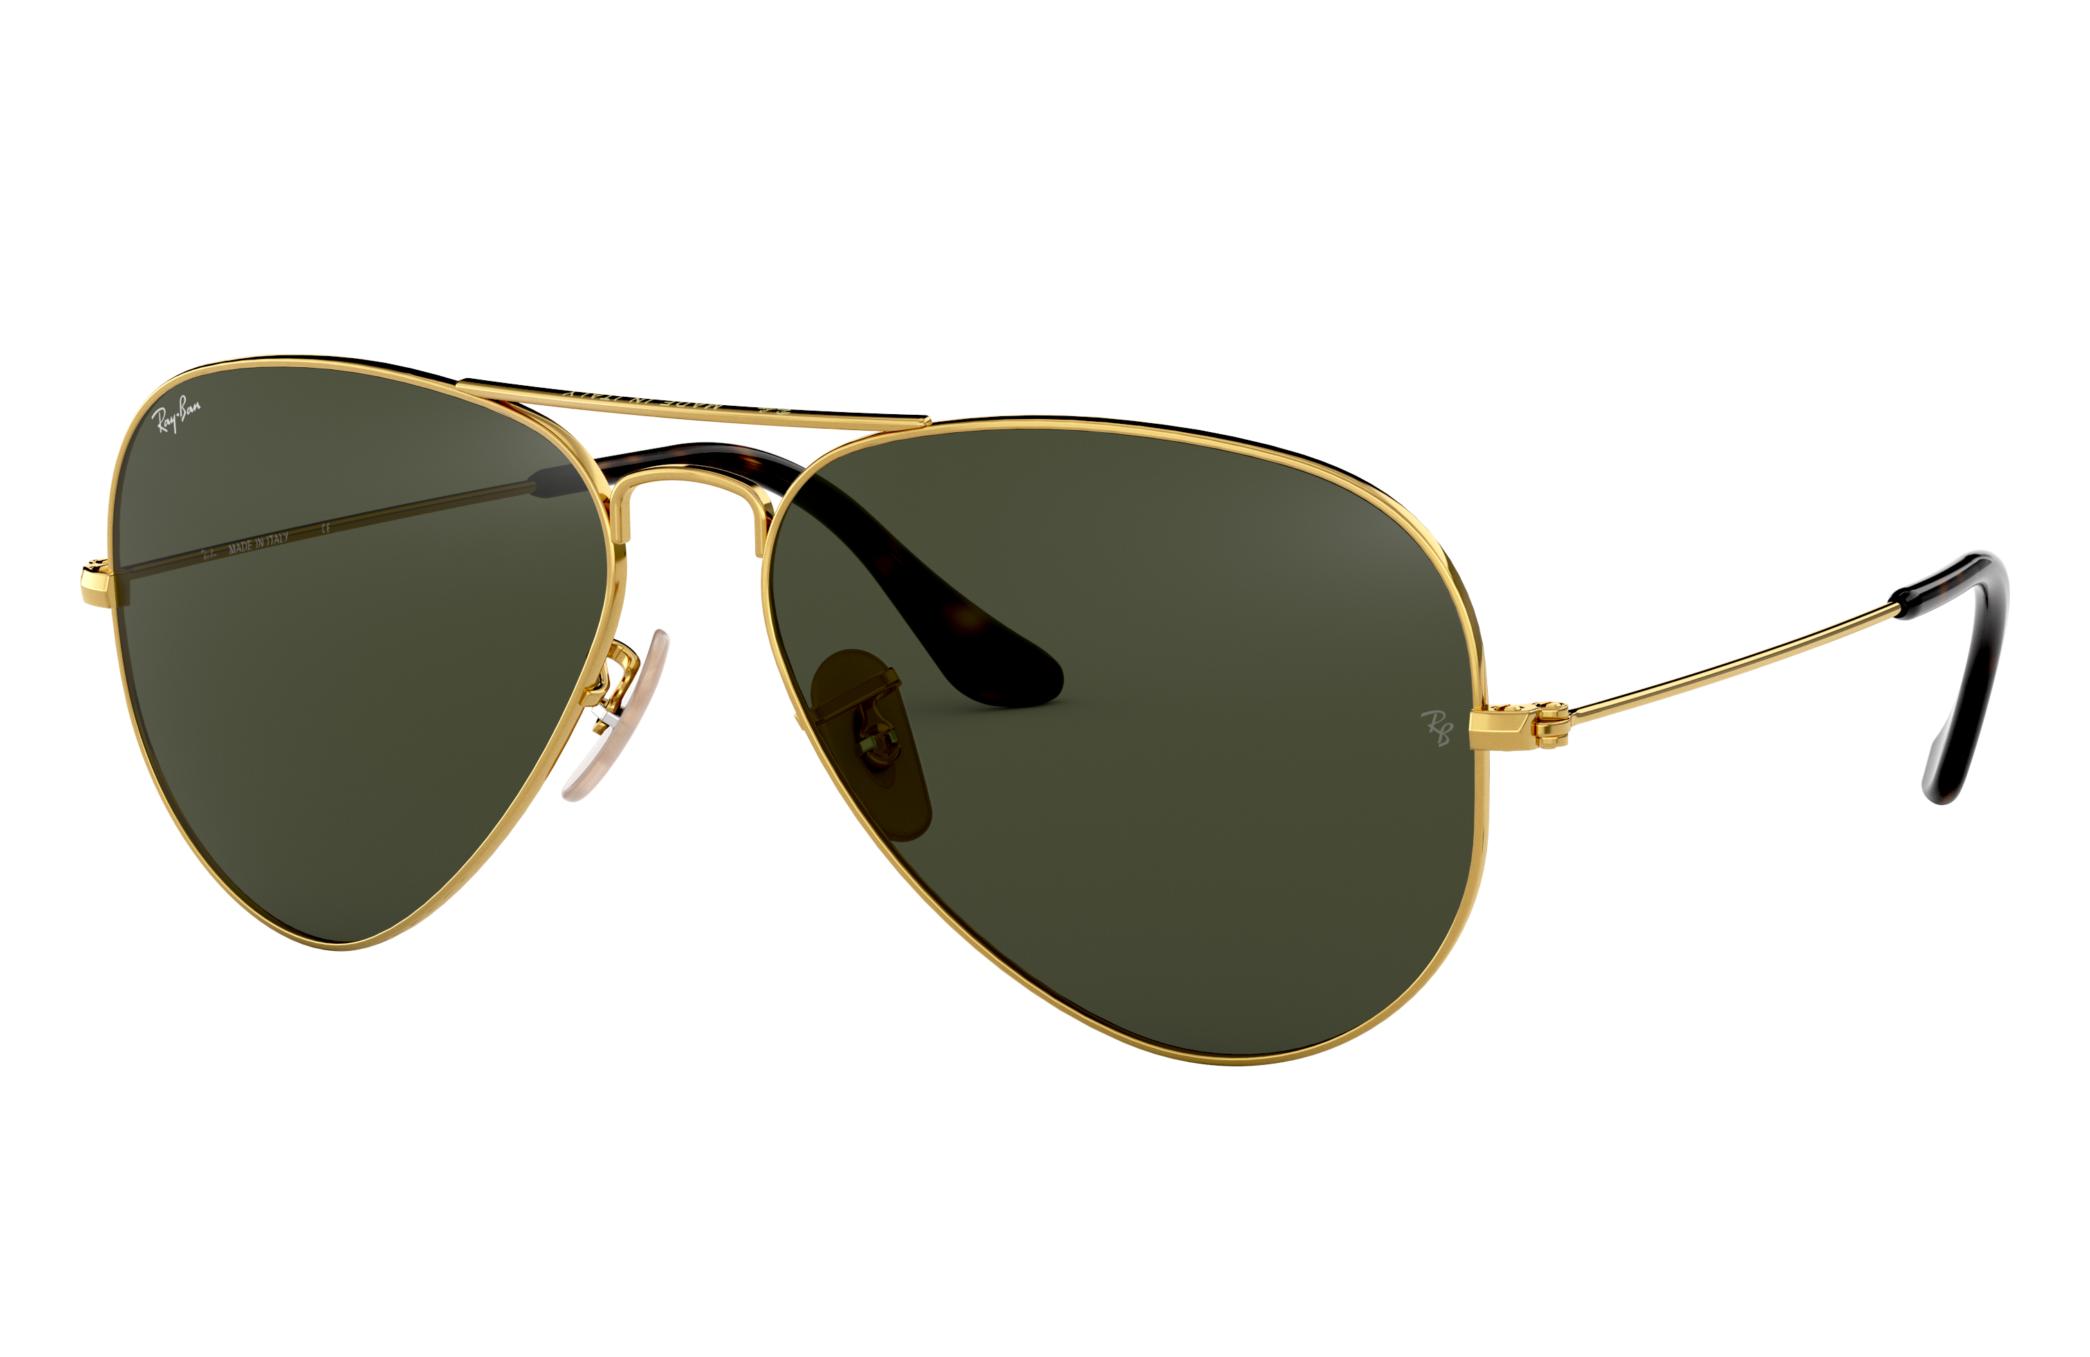 Ray-Ban Aviator Havana Collection Gold, Green Lenses - RB3025